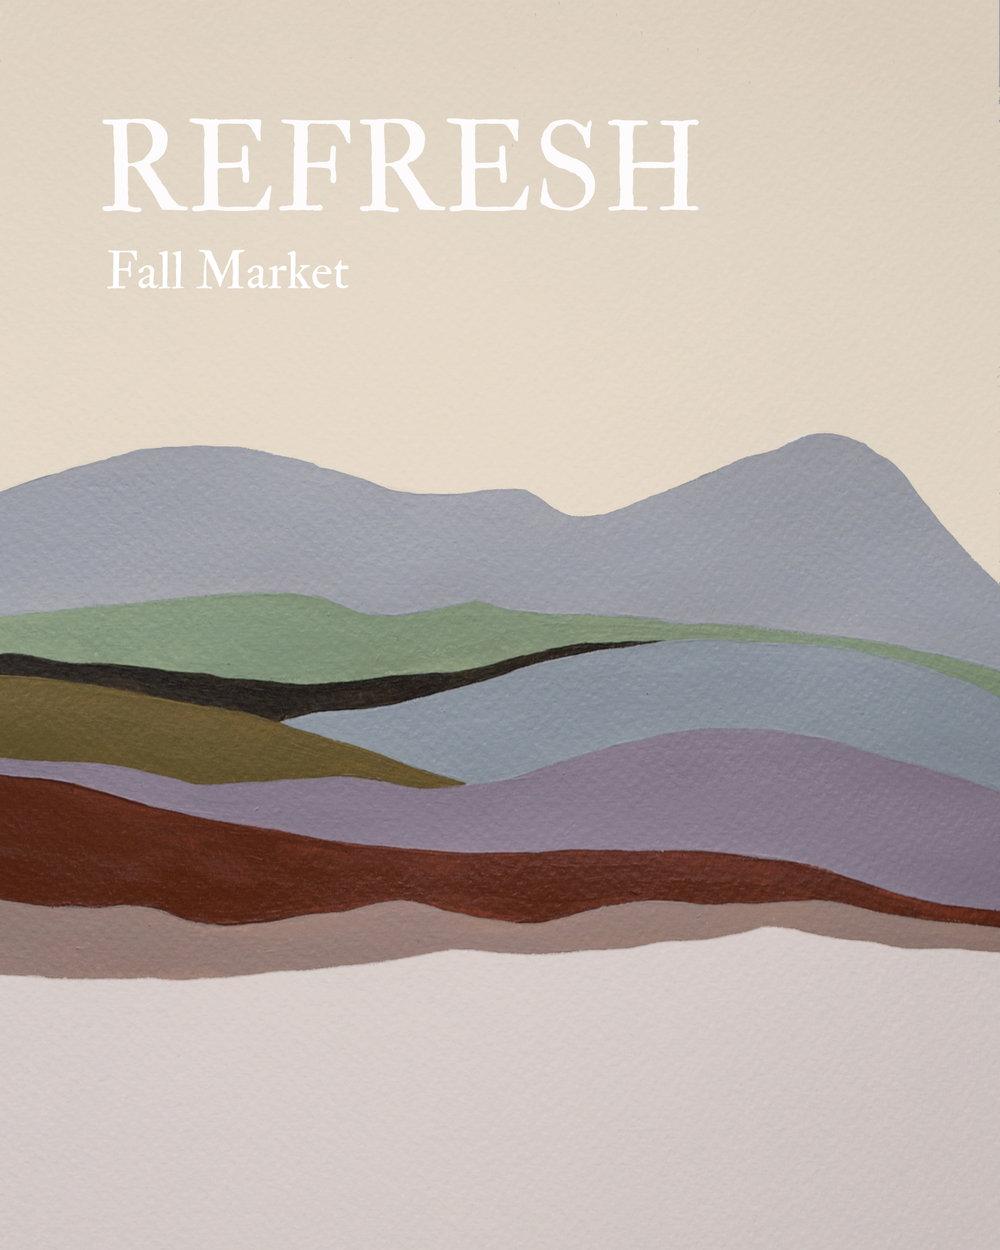 Refresh+Fall+Market+8x10+no+text+2019.jpg